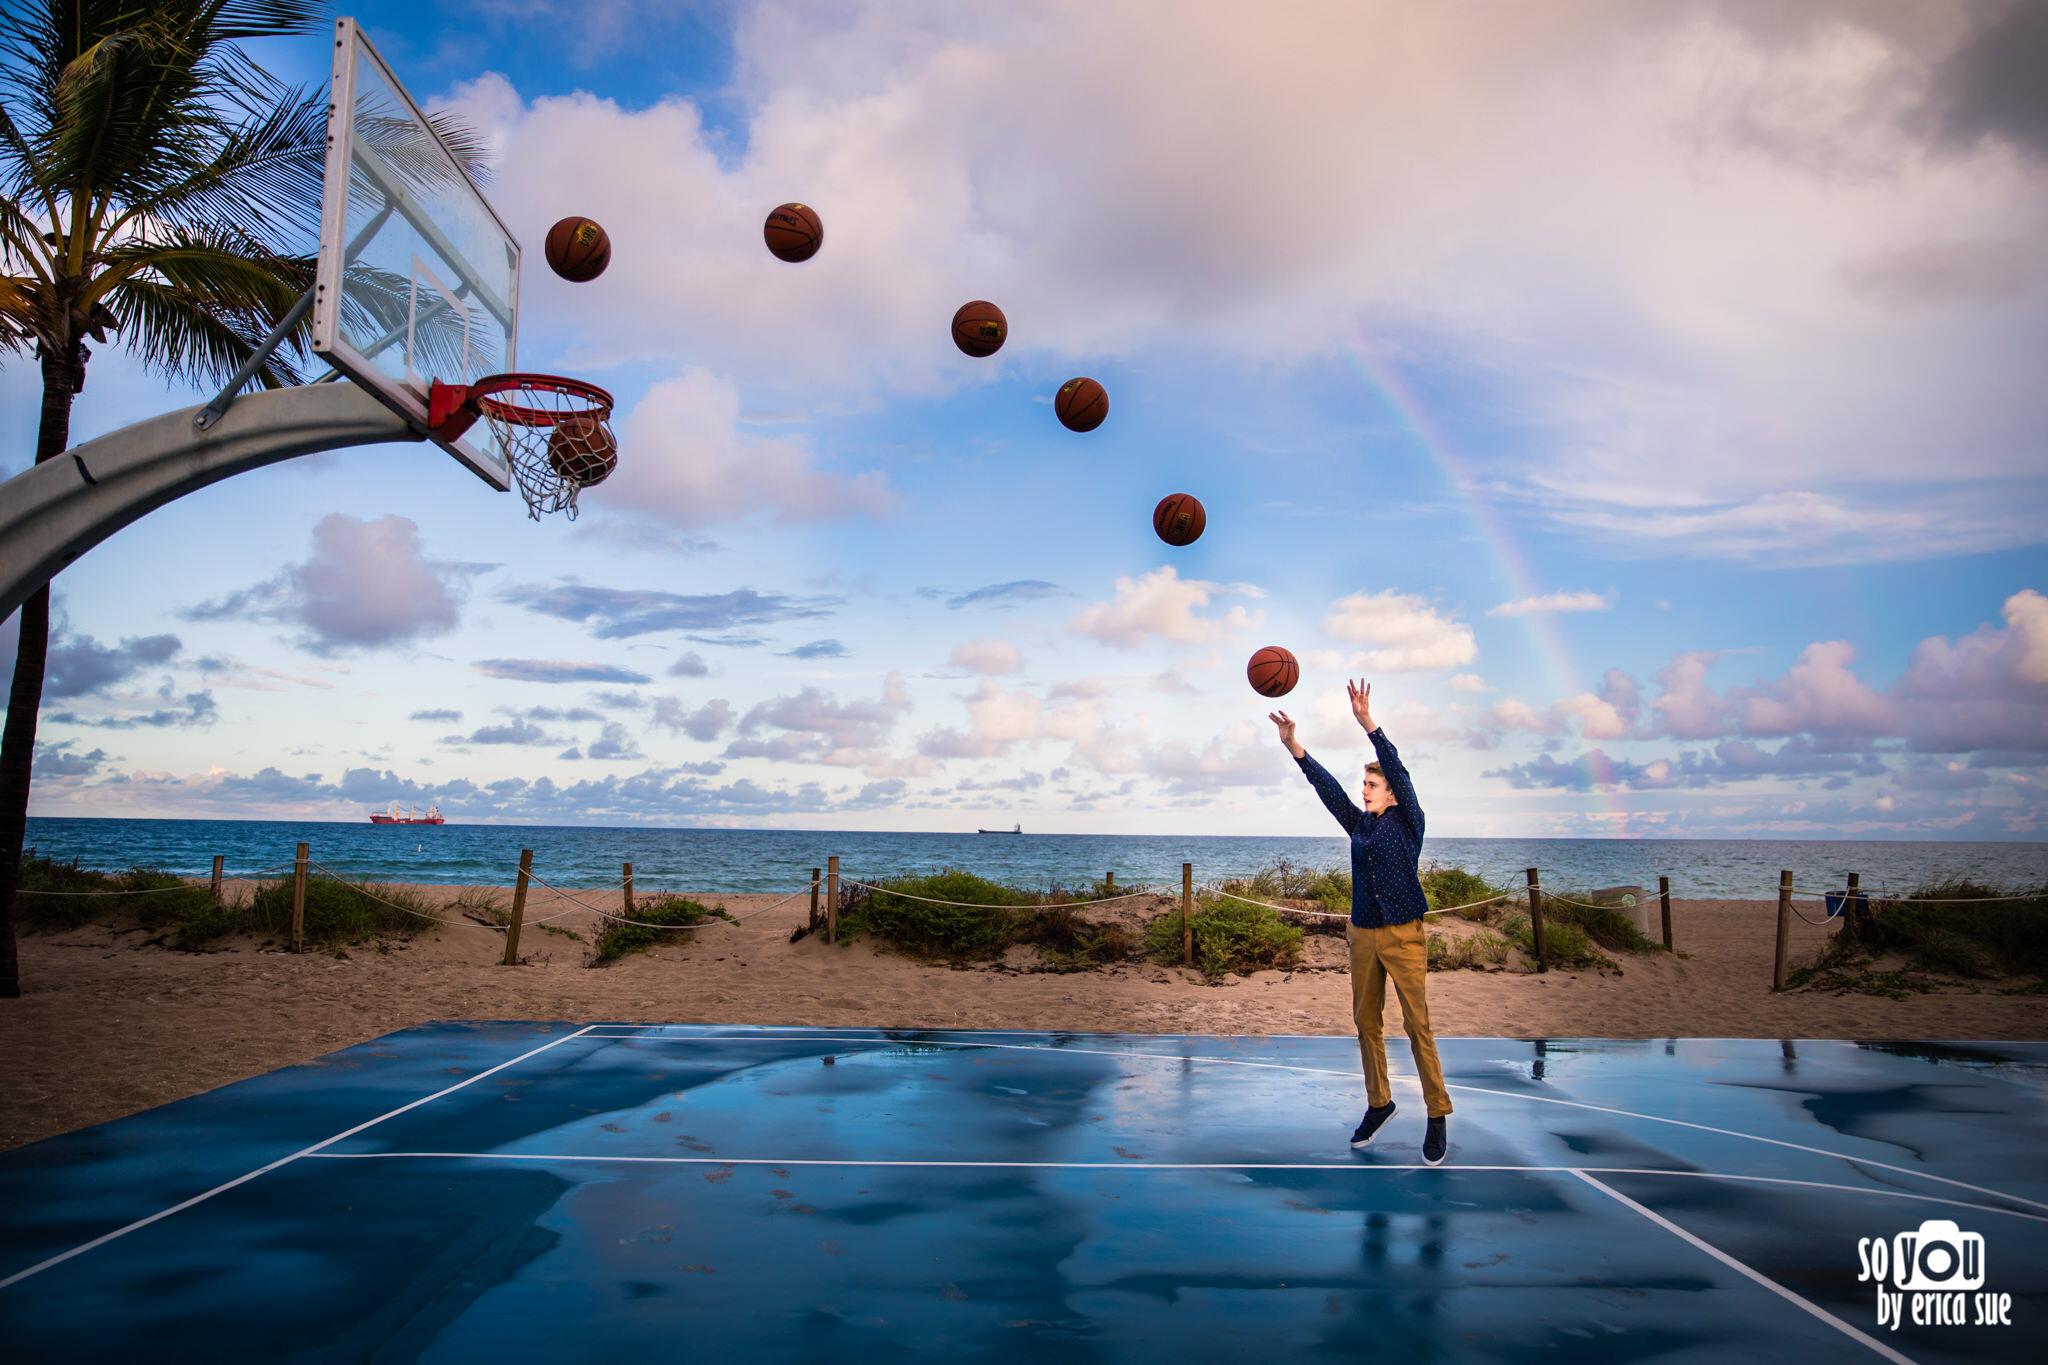 so-you-by-erica-sue-ft-lauderdale-beach-basketball-mitzvah-pre-shoot-.JPG